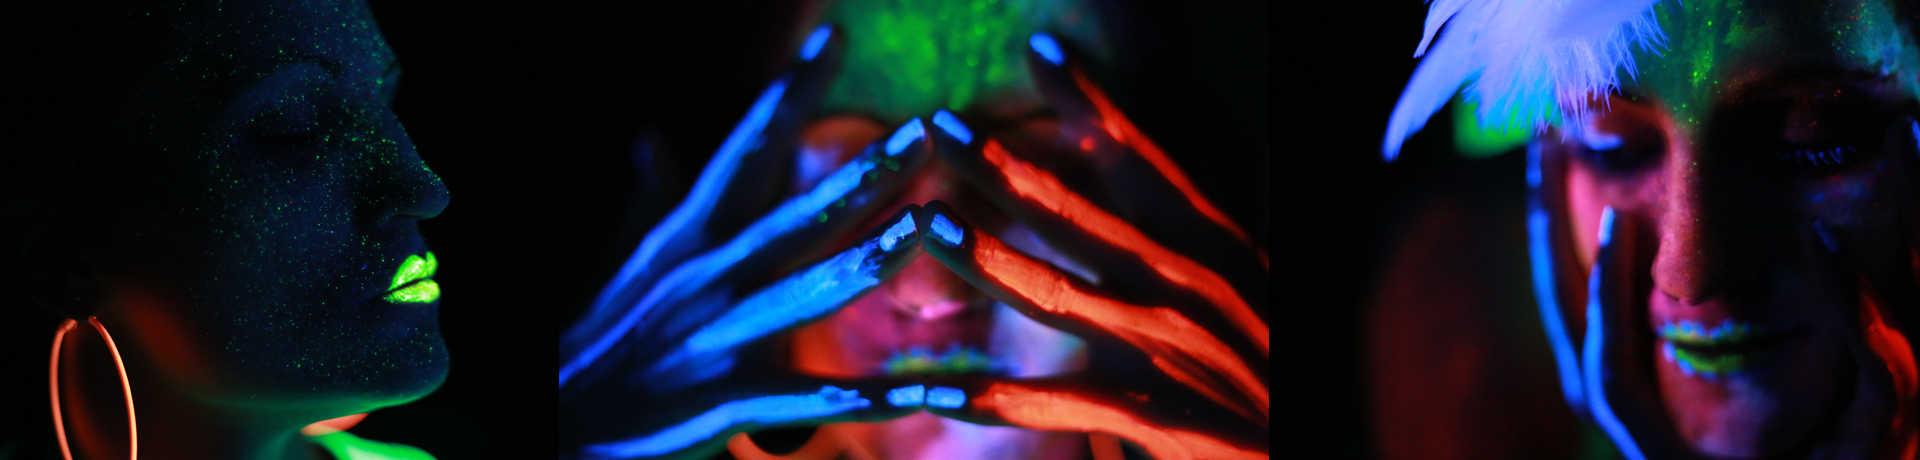 farbshooting-neon